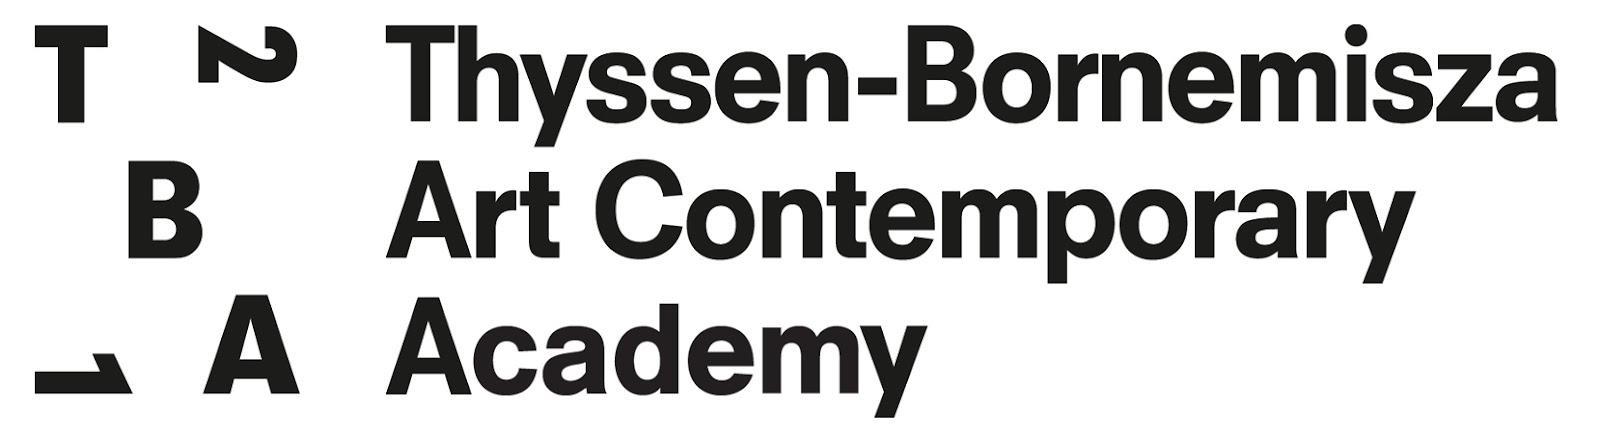 tba21-academy-logo.jpg